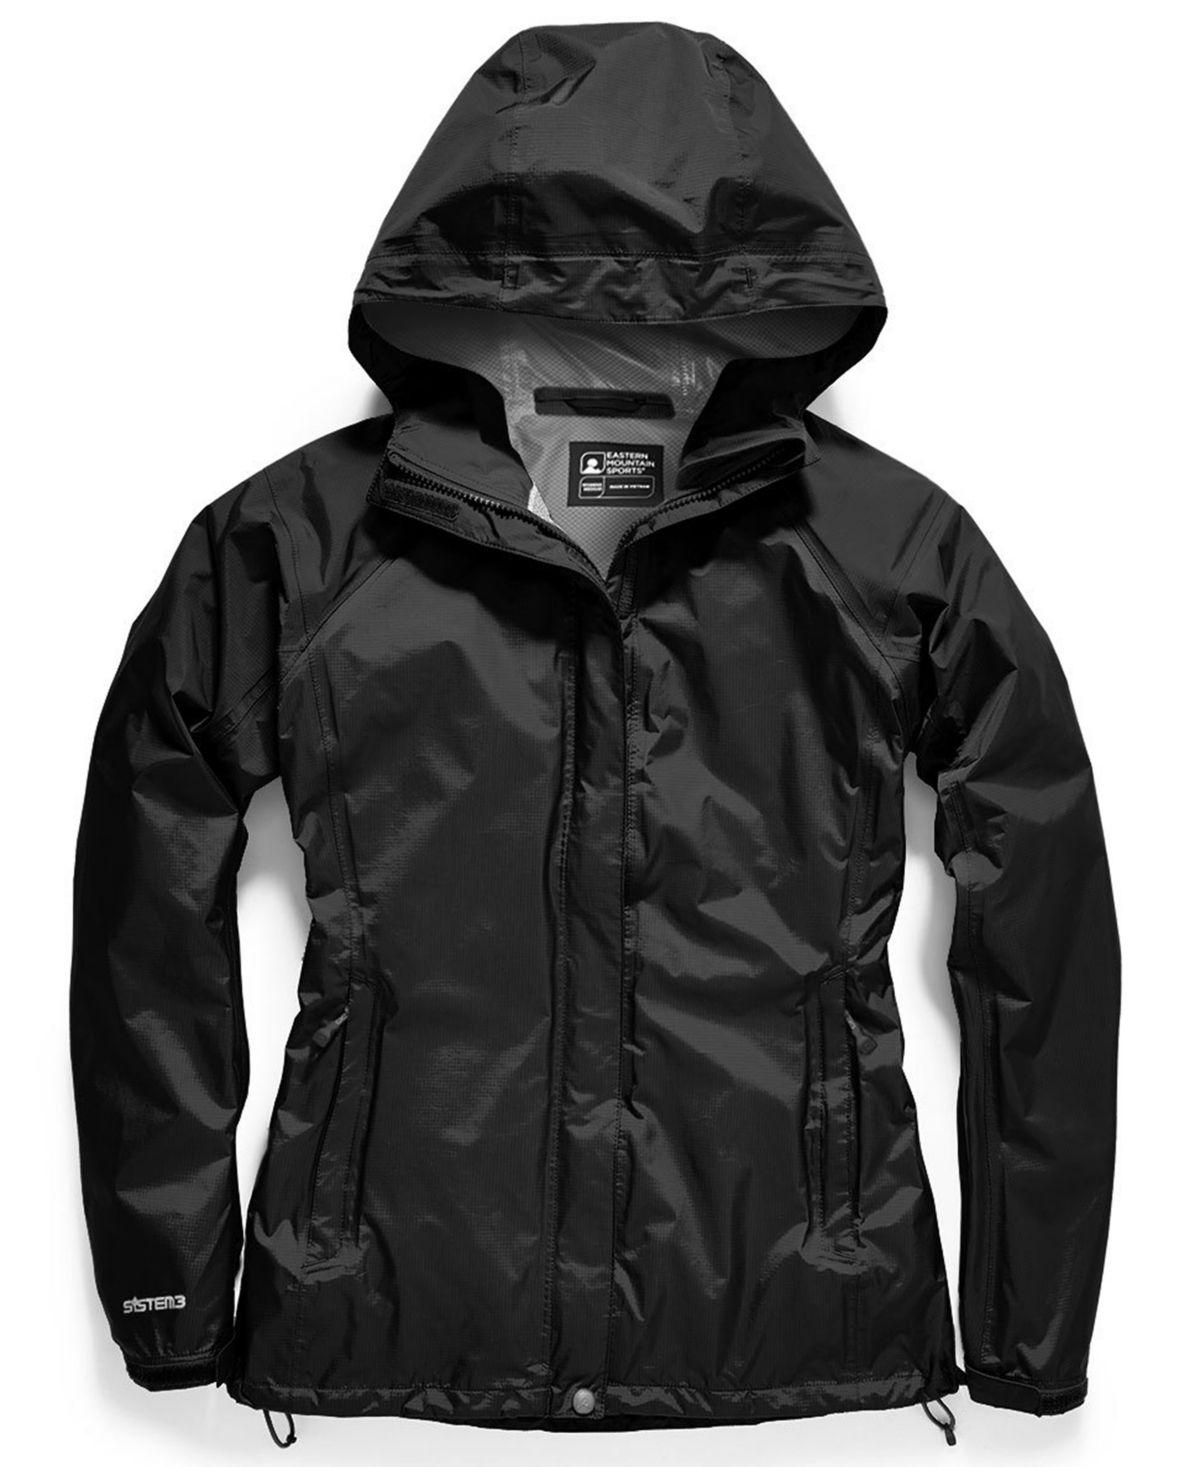 Ems Women's Thunderhead Jacket Black (With images